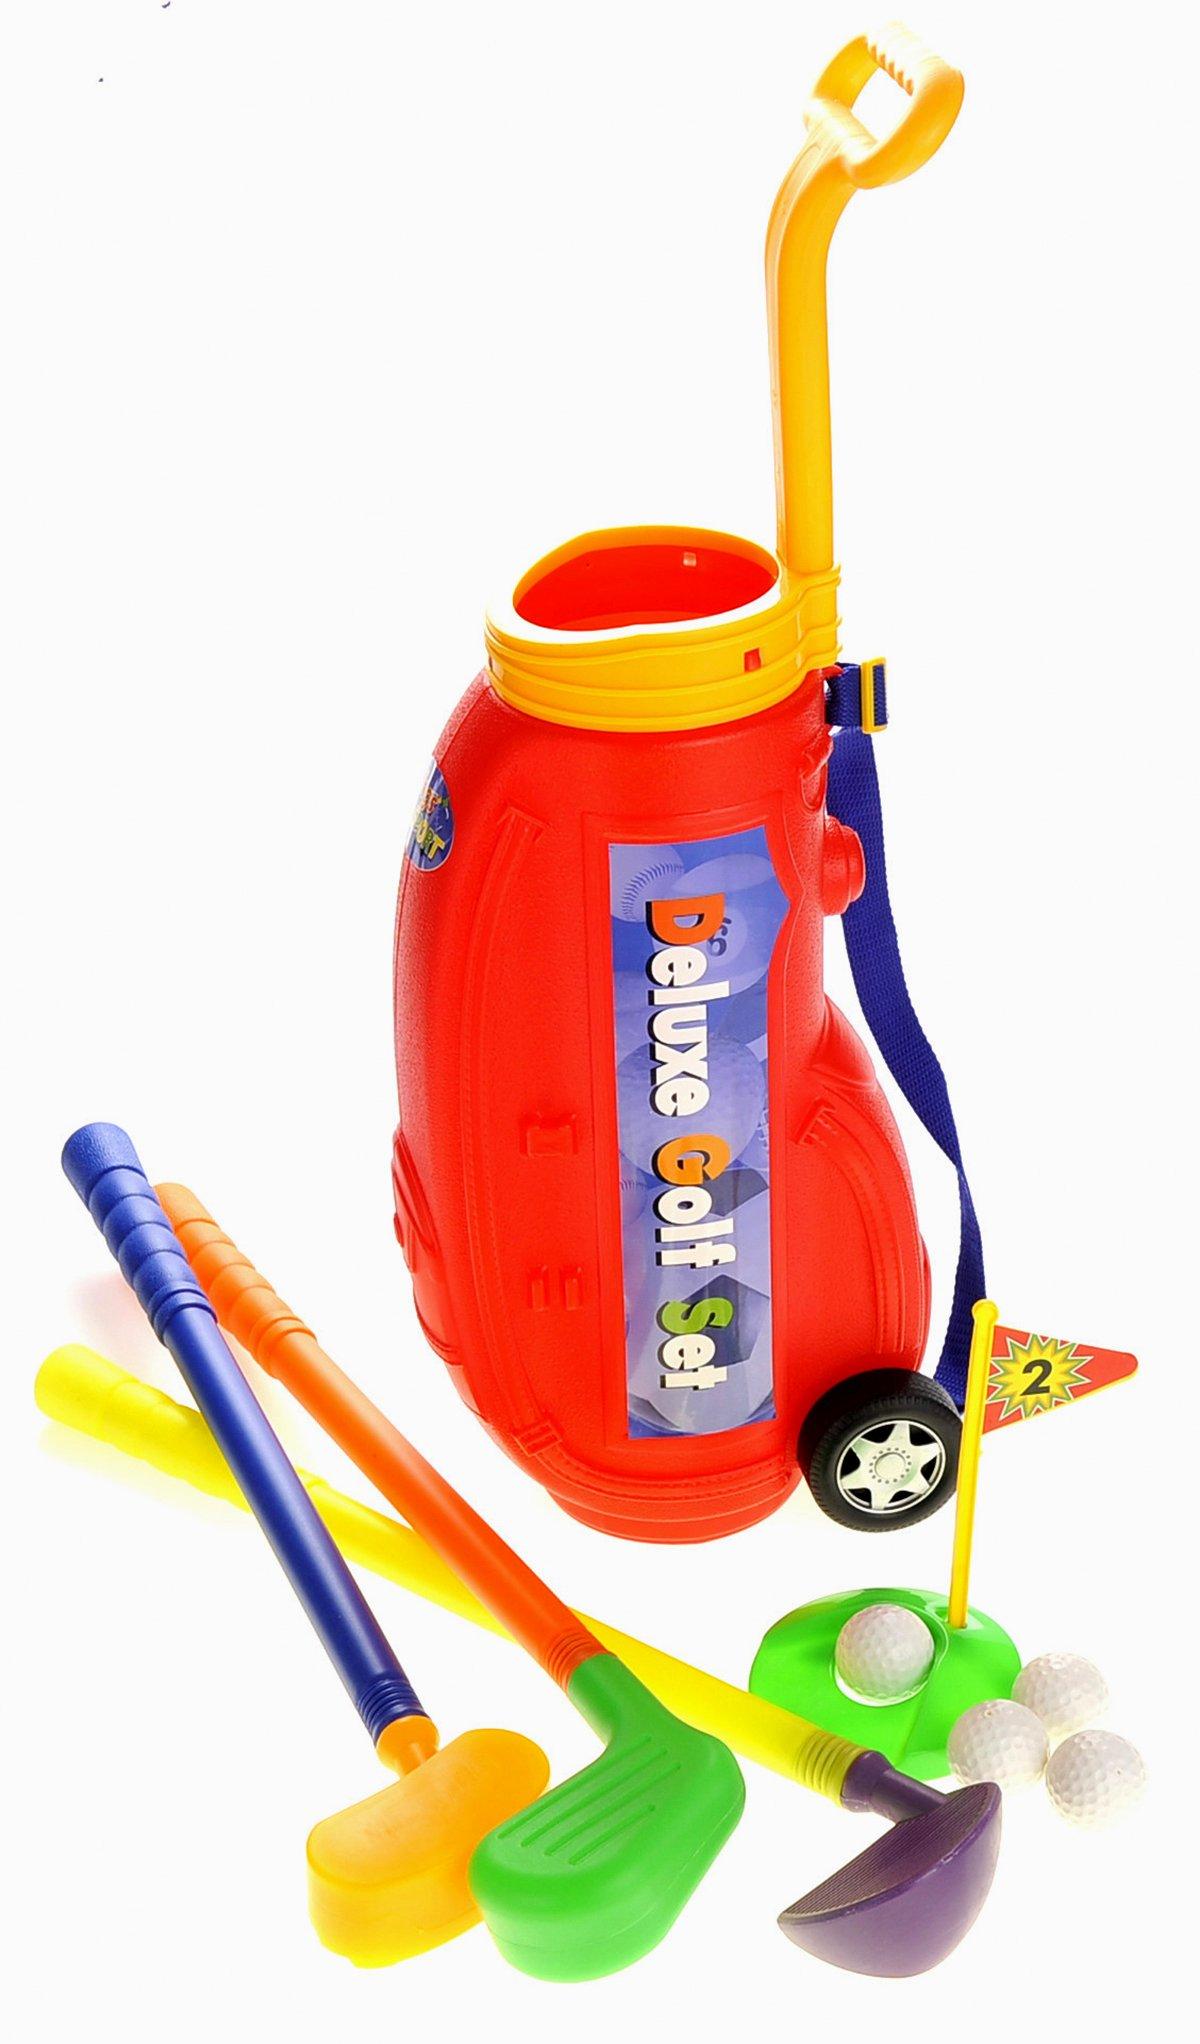 PowerTRC Deluxe Golf Play-Set for Kids w/ Easy Storage by PowerTRC